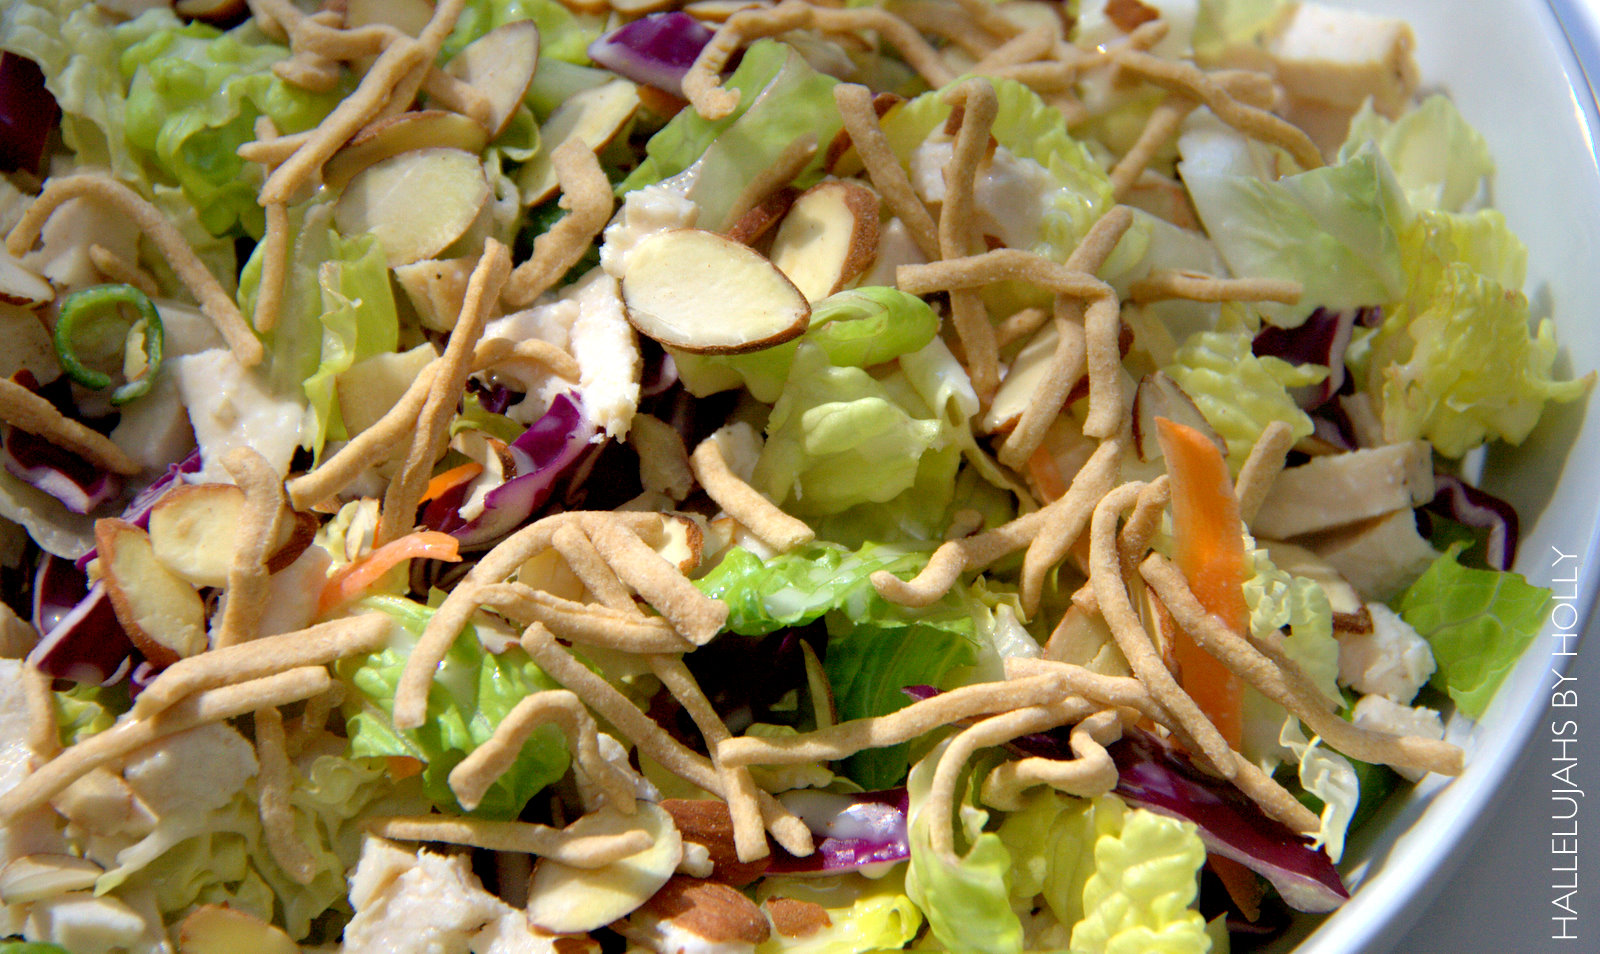 Applebees Grilled Chicken Oriental Salad - CopyKat Recipes